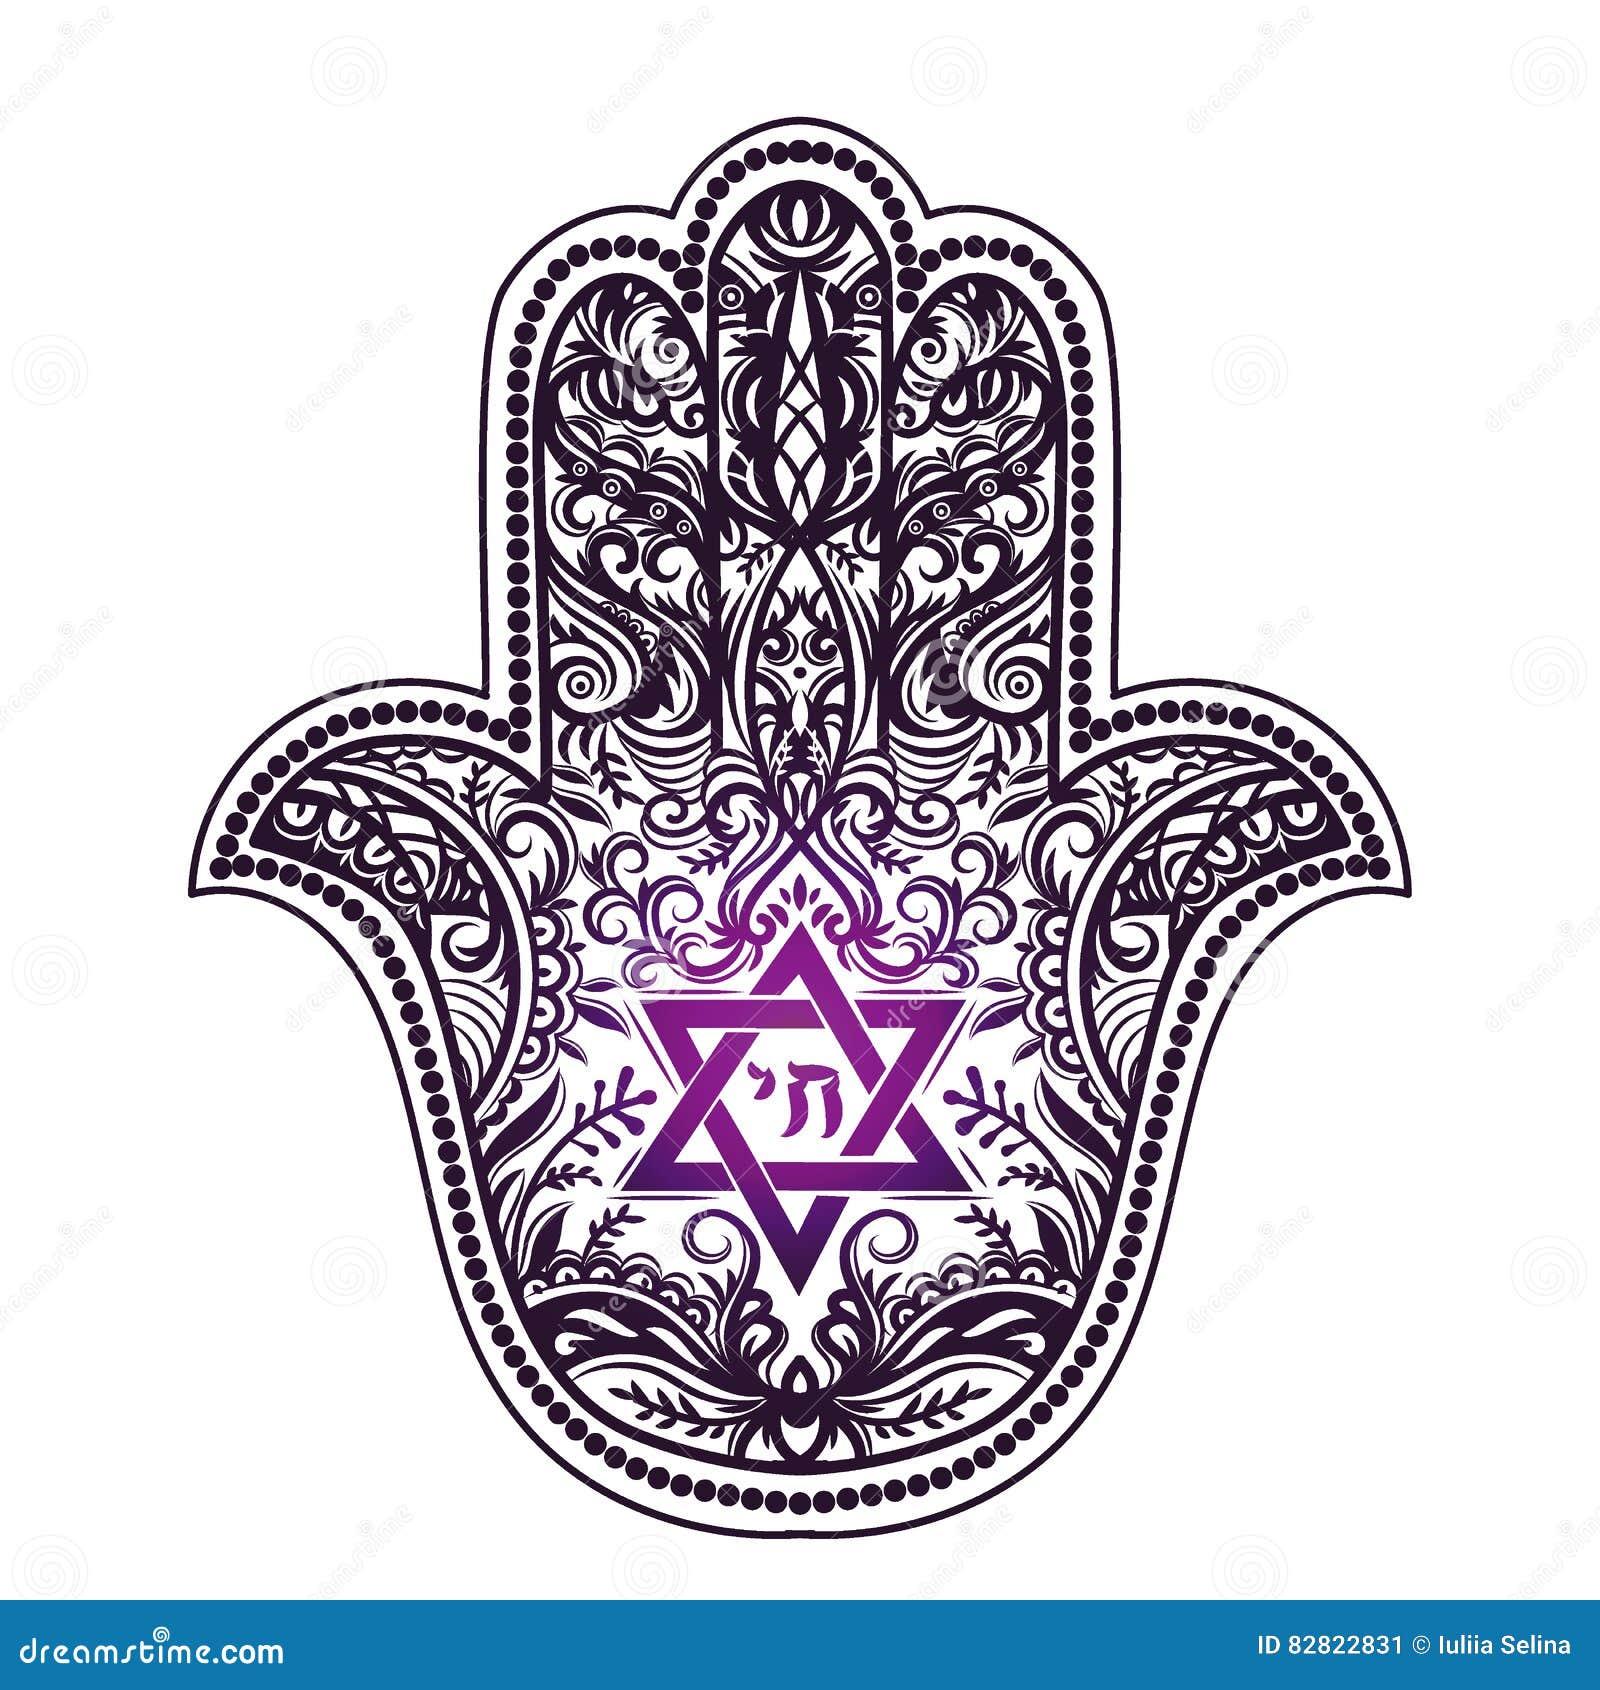 Jewish hamsa tattoo stock illustration illustration of kosher royalty free illustration biocorpaavc Choice Image